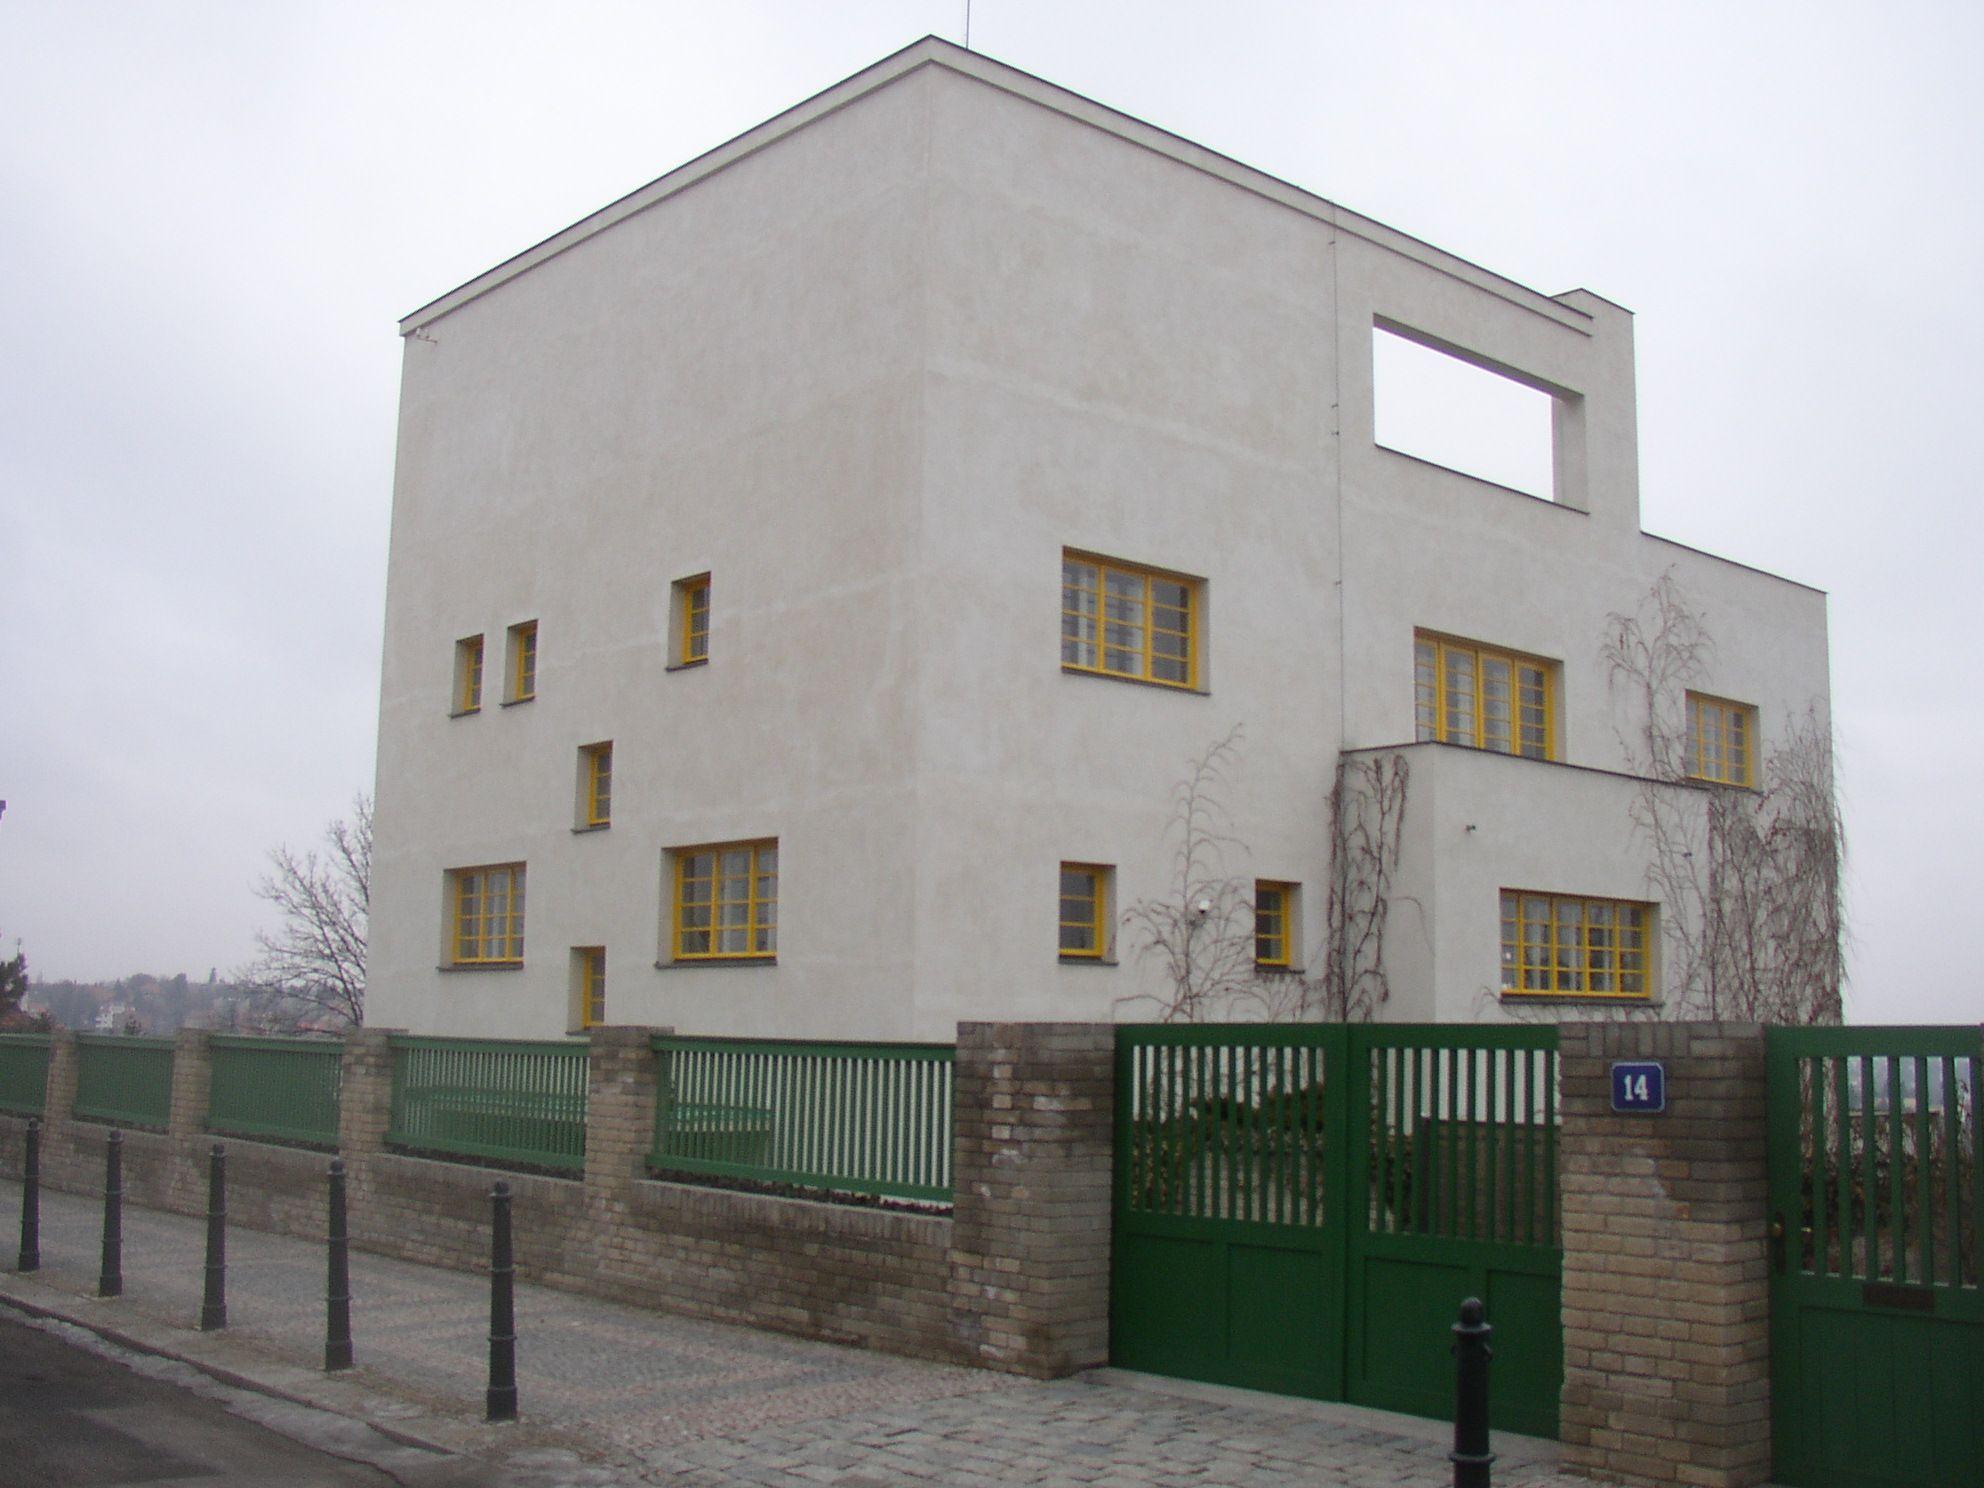 http://upload.wikimedia.org/wikipedia/commons/a/ae/Villa_Muller_071.jpg